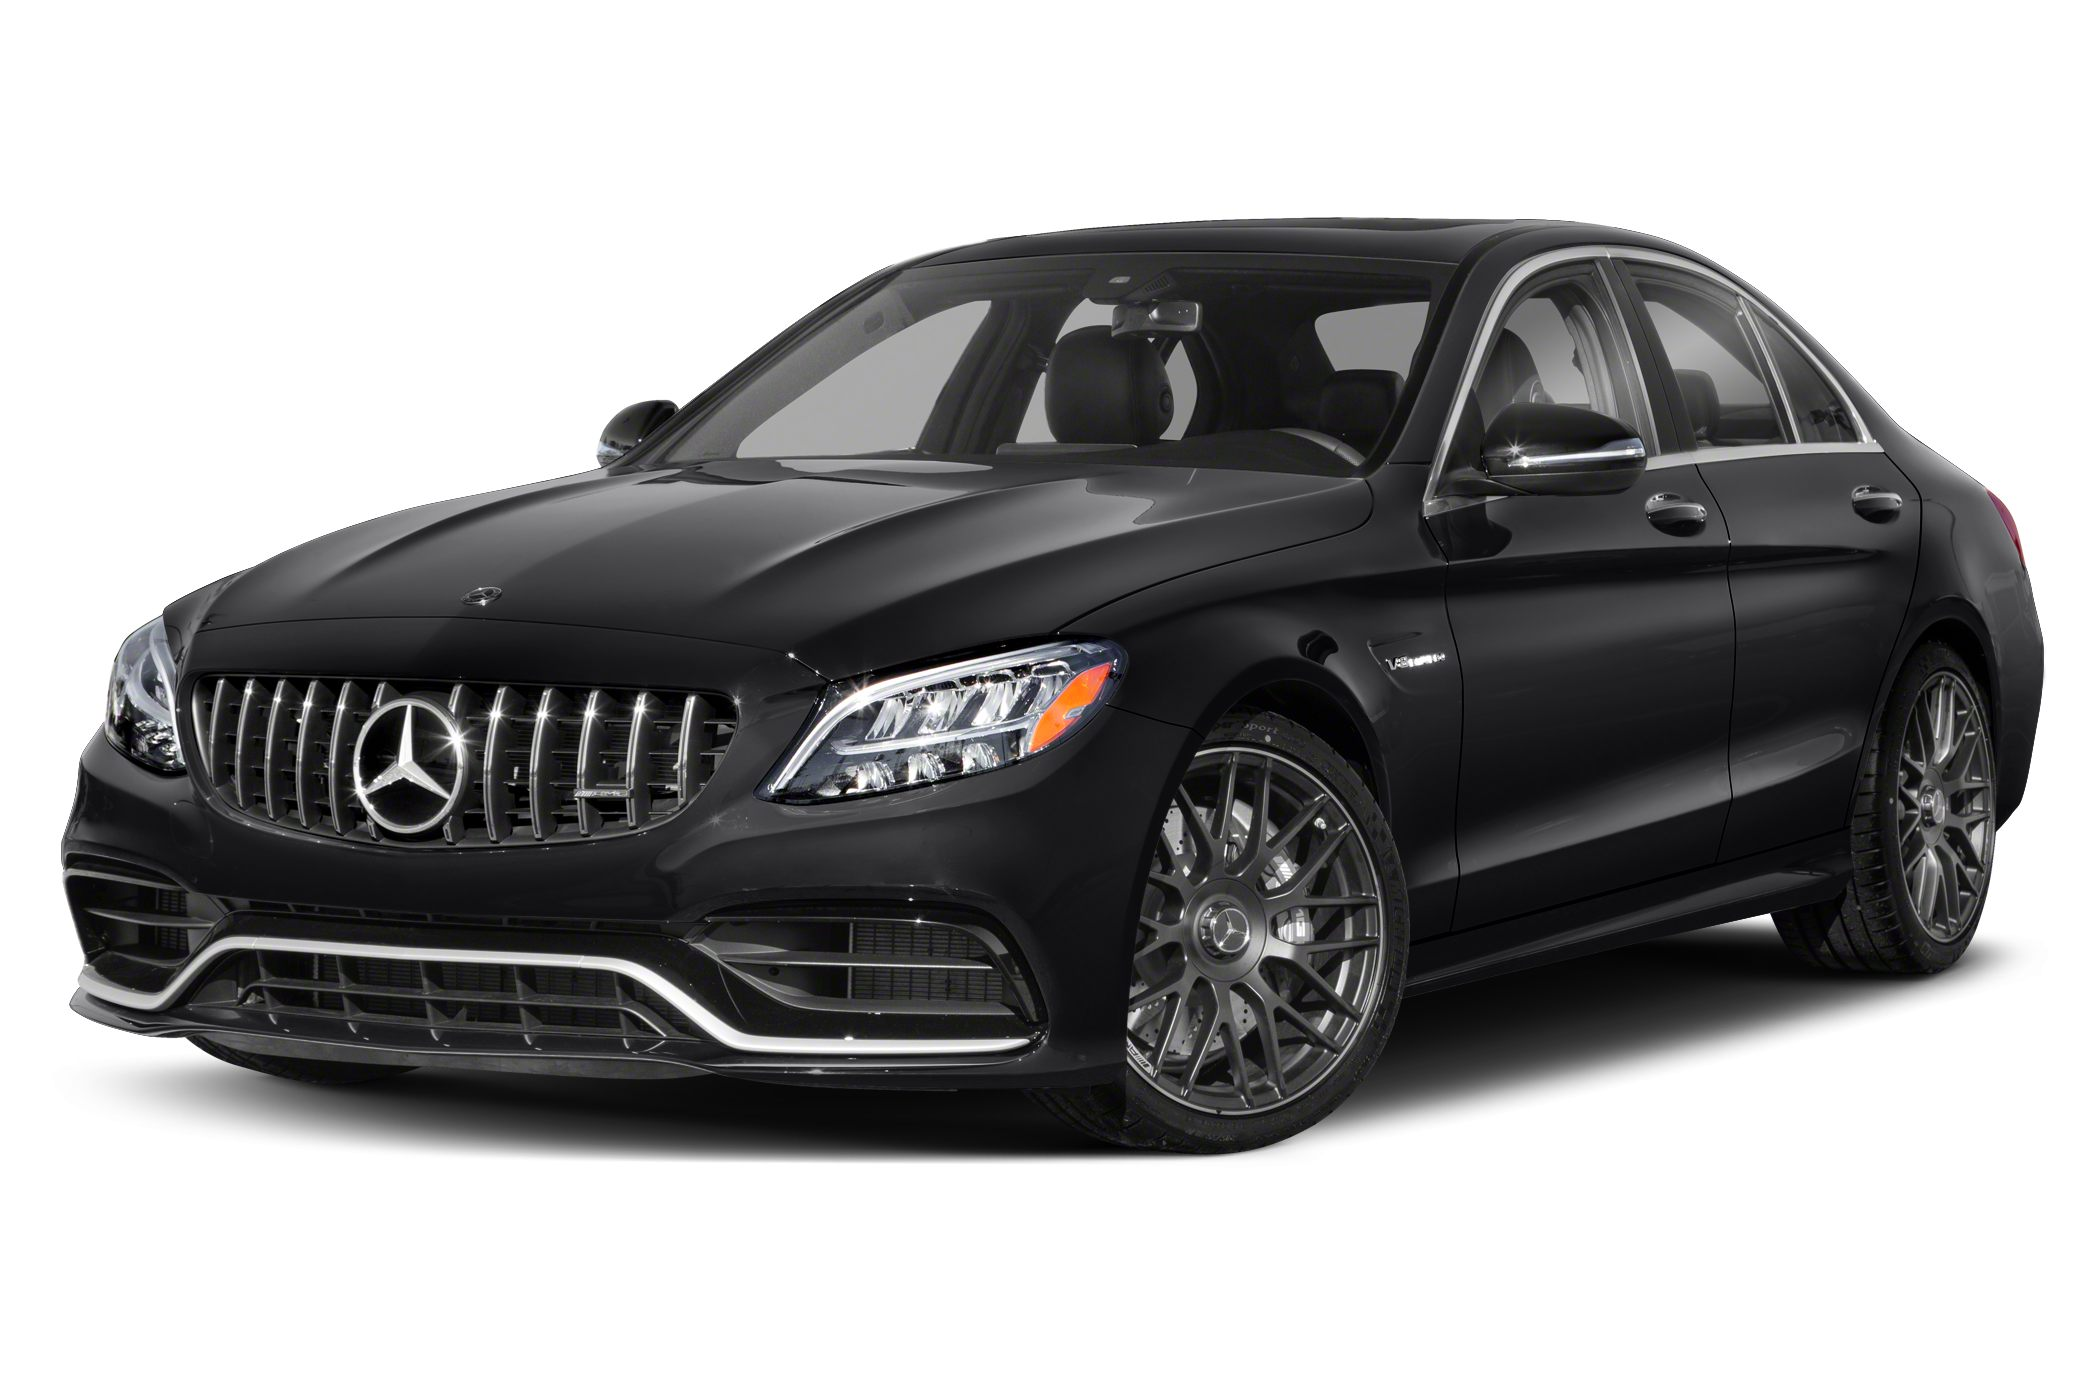 2020 Mercedes Benz Amg C 63 S Amg C 63 4dr Sedan Specs And Prices